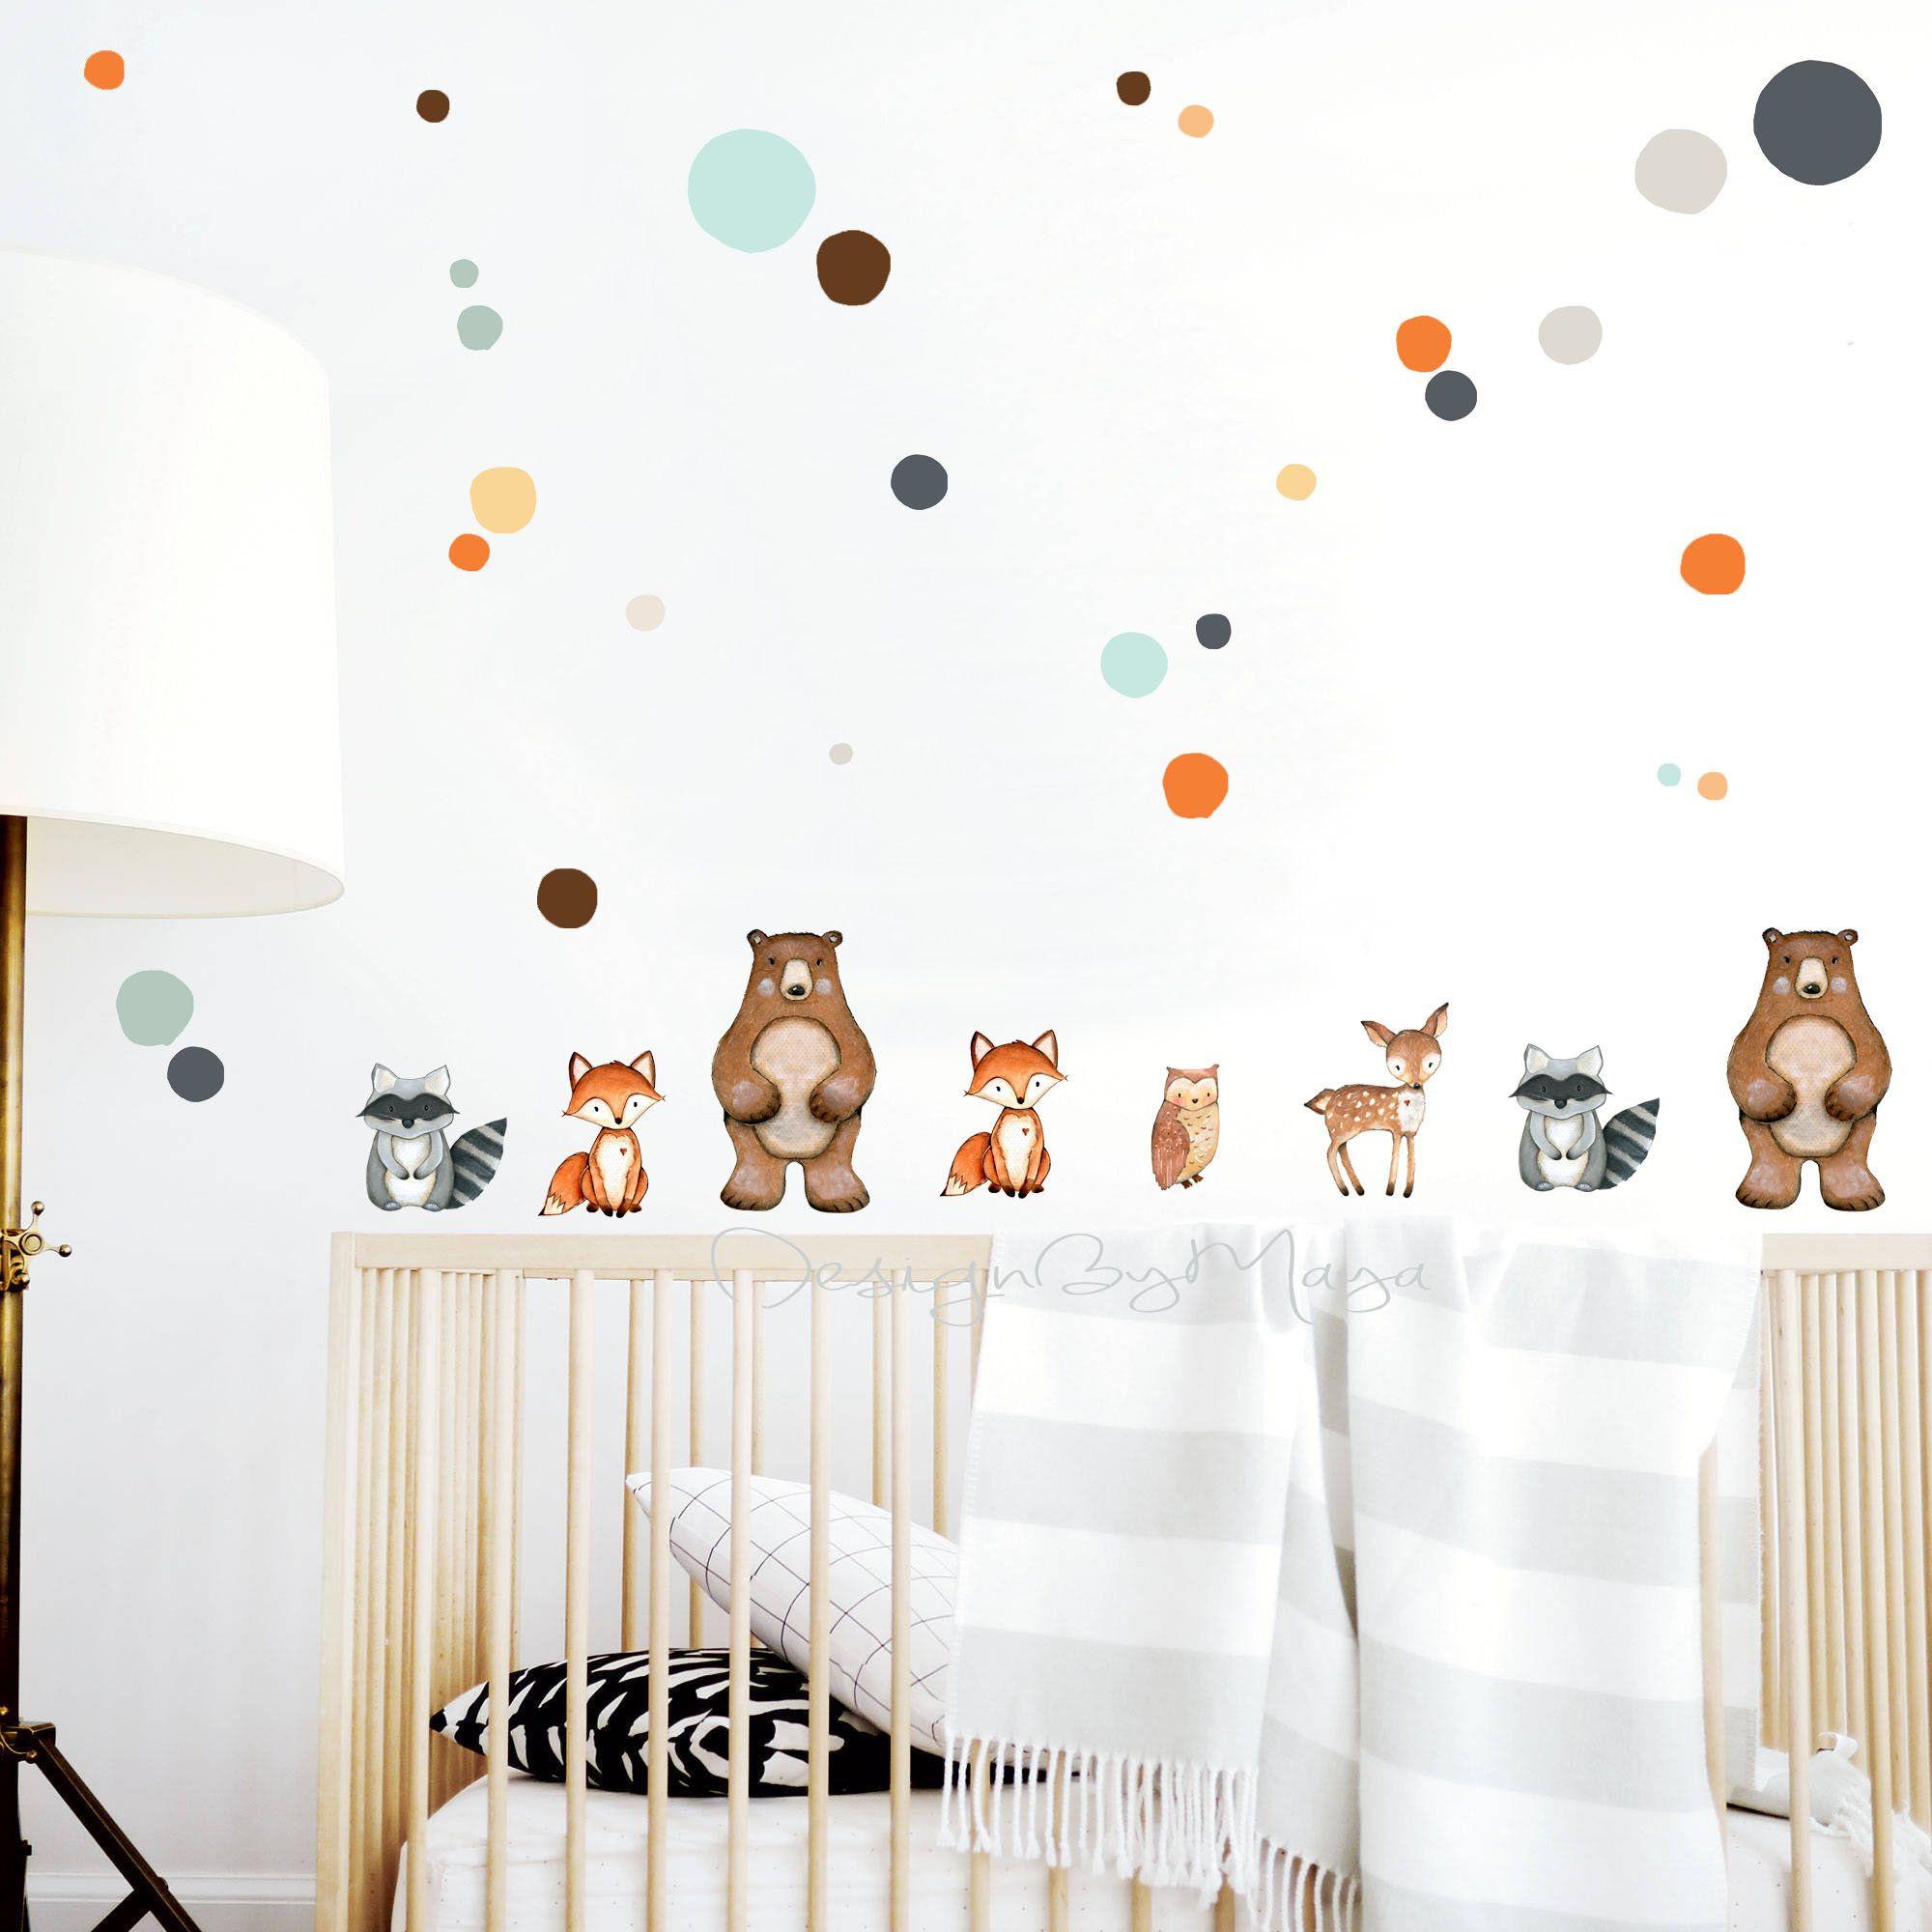 Nursery Decal Woodland Animal Decals Polka Dots Stickers   Etsy   Nursery Wall Decals, Nursery Decals, Baby Room Decor